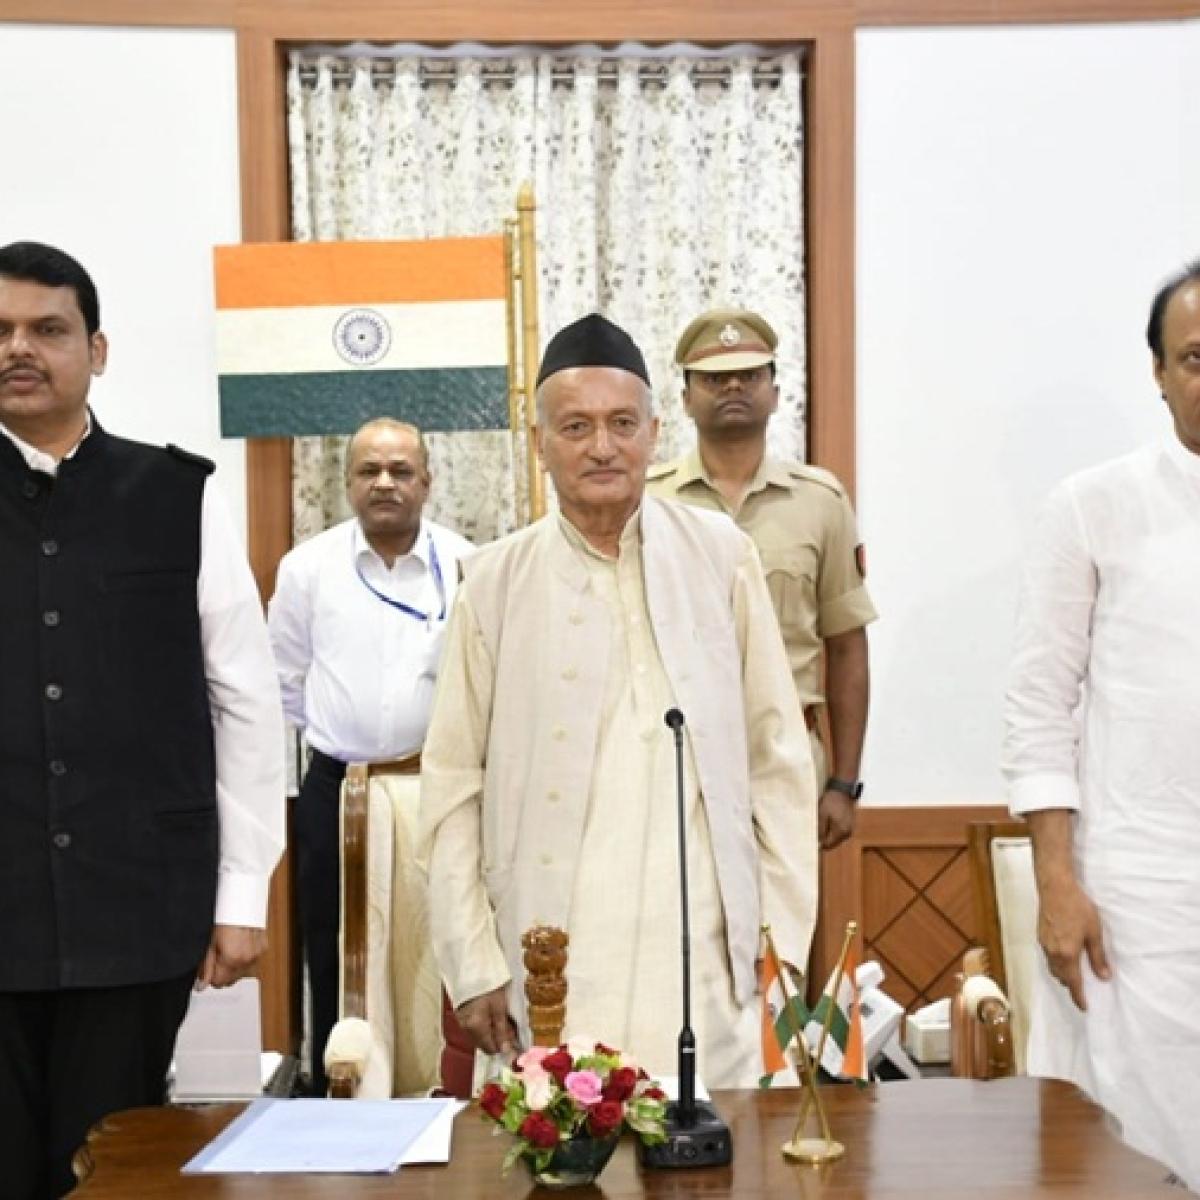 Maha govt formation: How even Doordarshan had no 'darshan' of Fadnavis' swearing-in